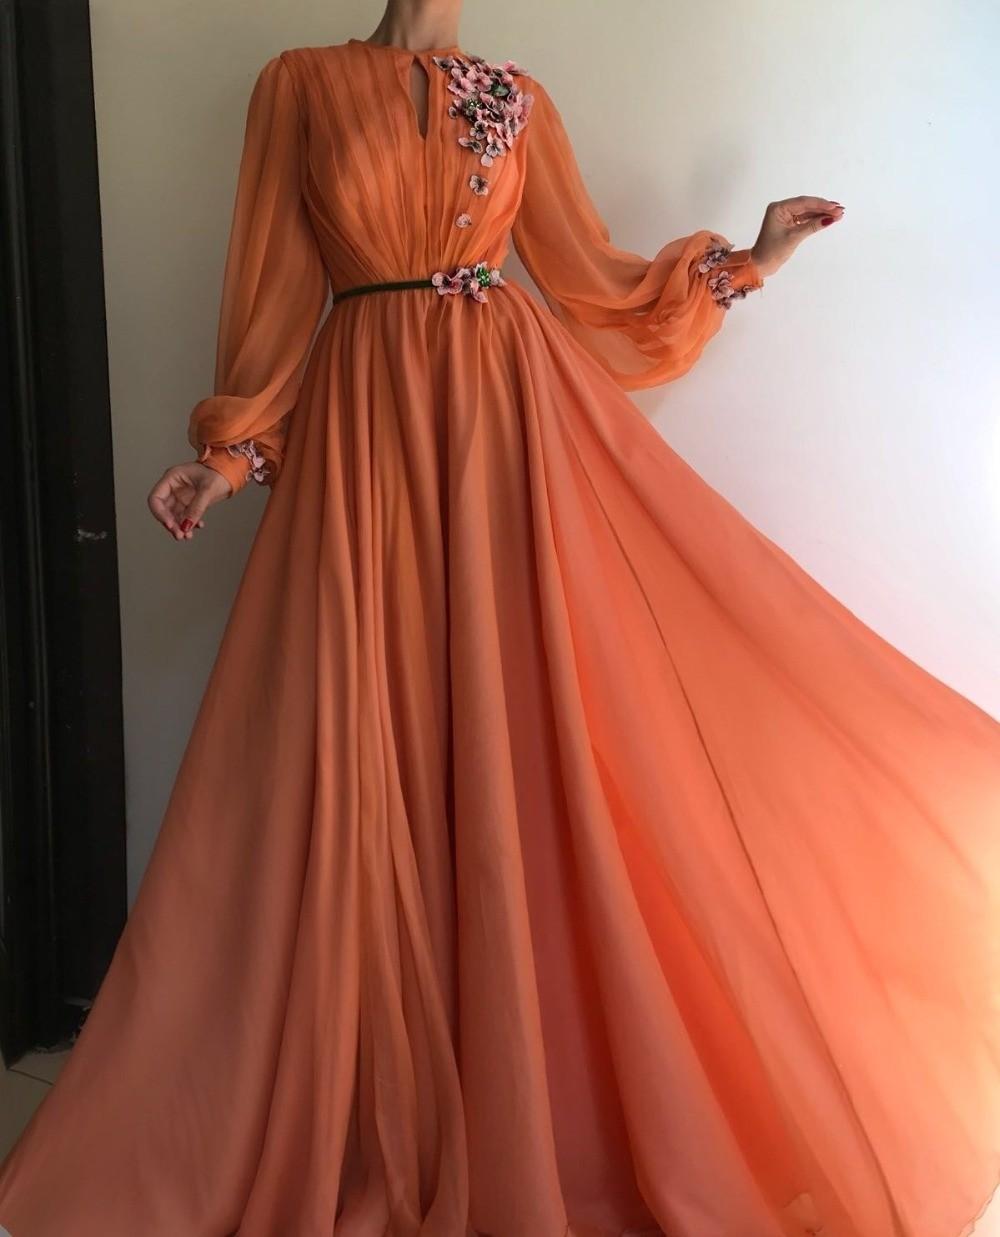 Image 3 - Muslim Orange Long Sleeves Flowers Dubai Evening Dresses A Line  Chiffon Islamic Saudi Arabic Long Prom Gown  Robe de soireeEvening  Dresses